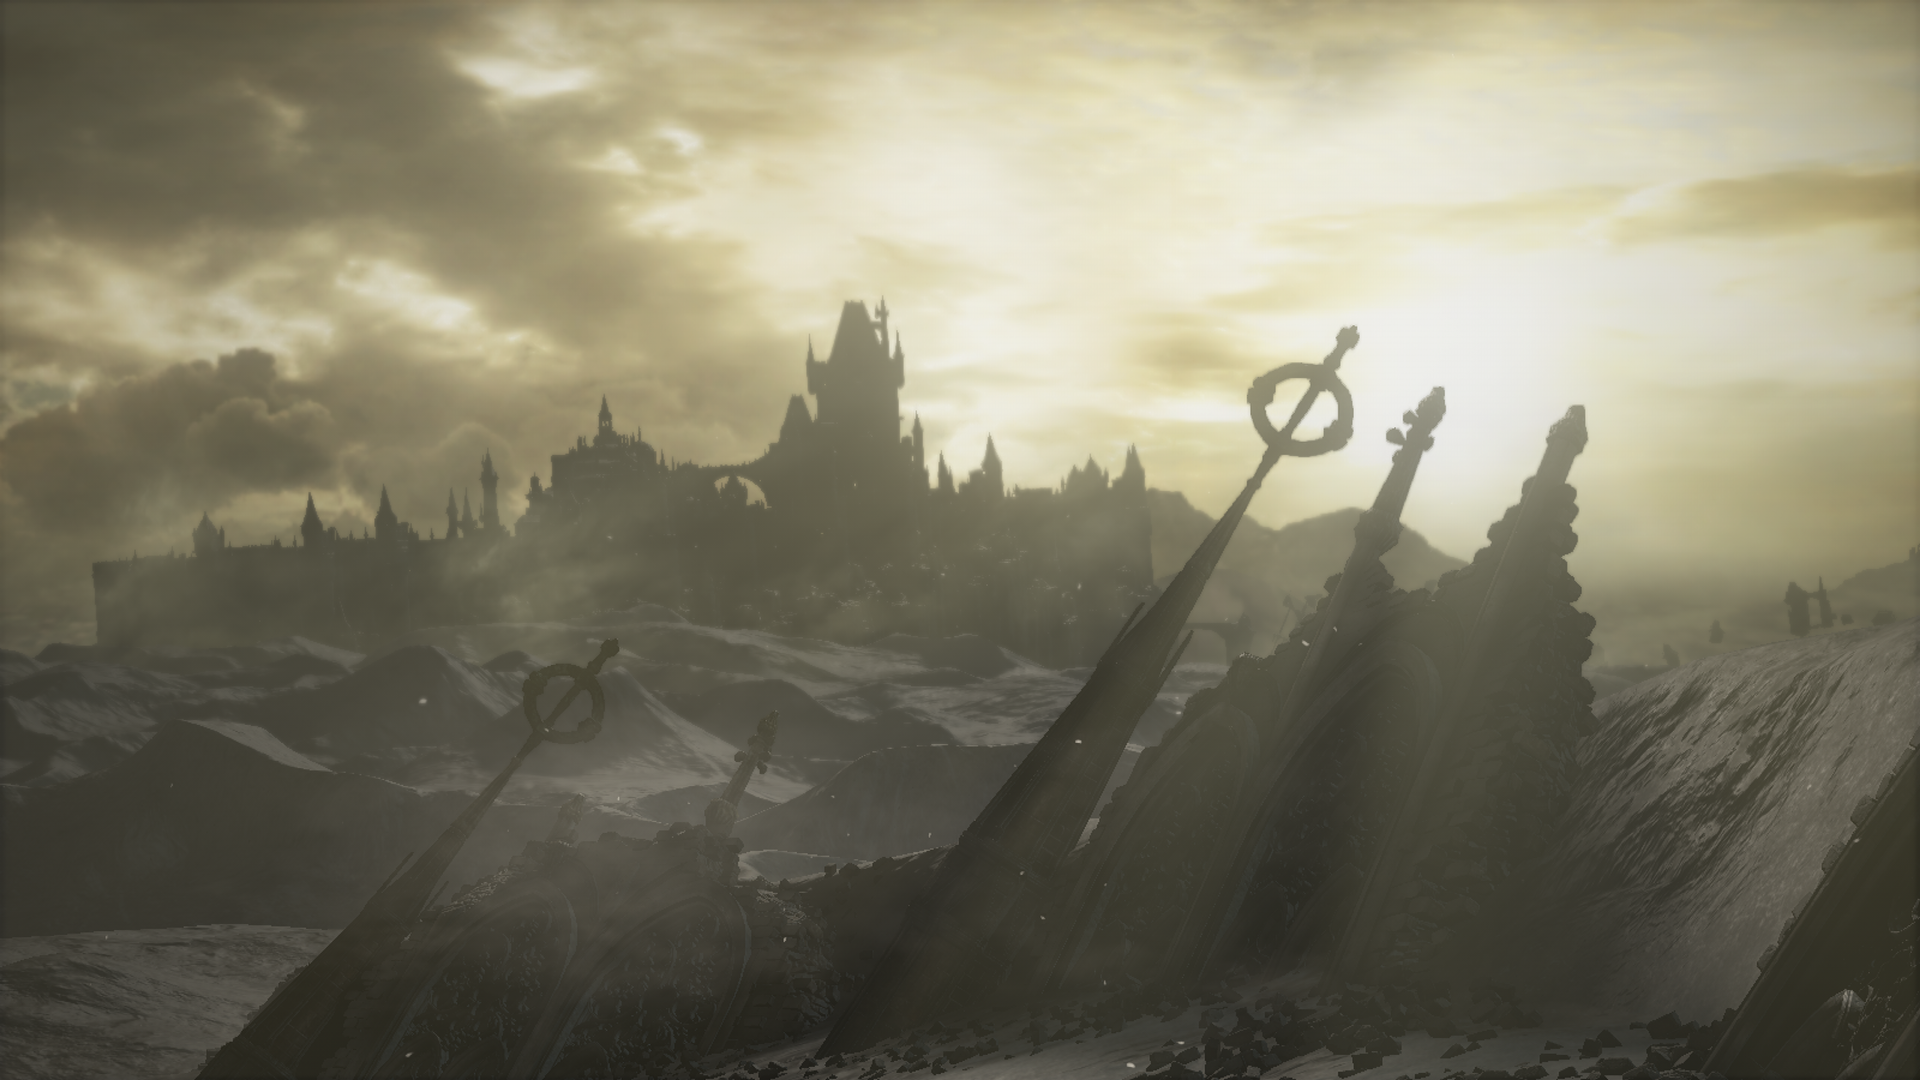 Dark Souls 3 The Ringed City By Bartock26 On Deviantart